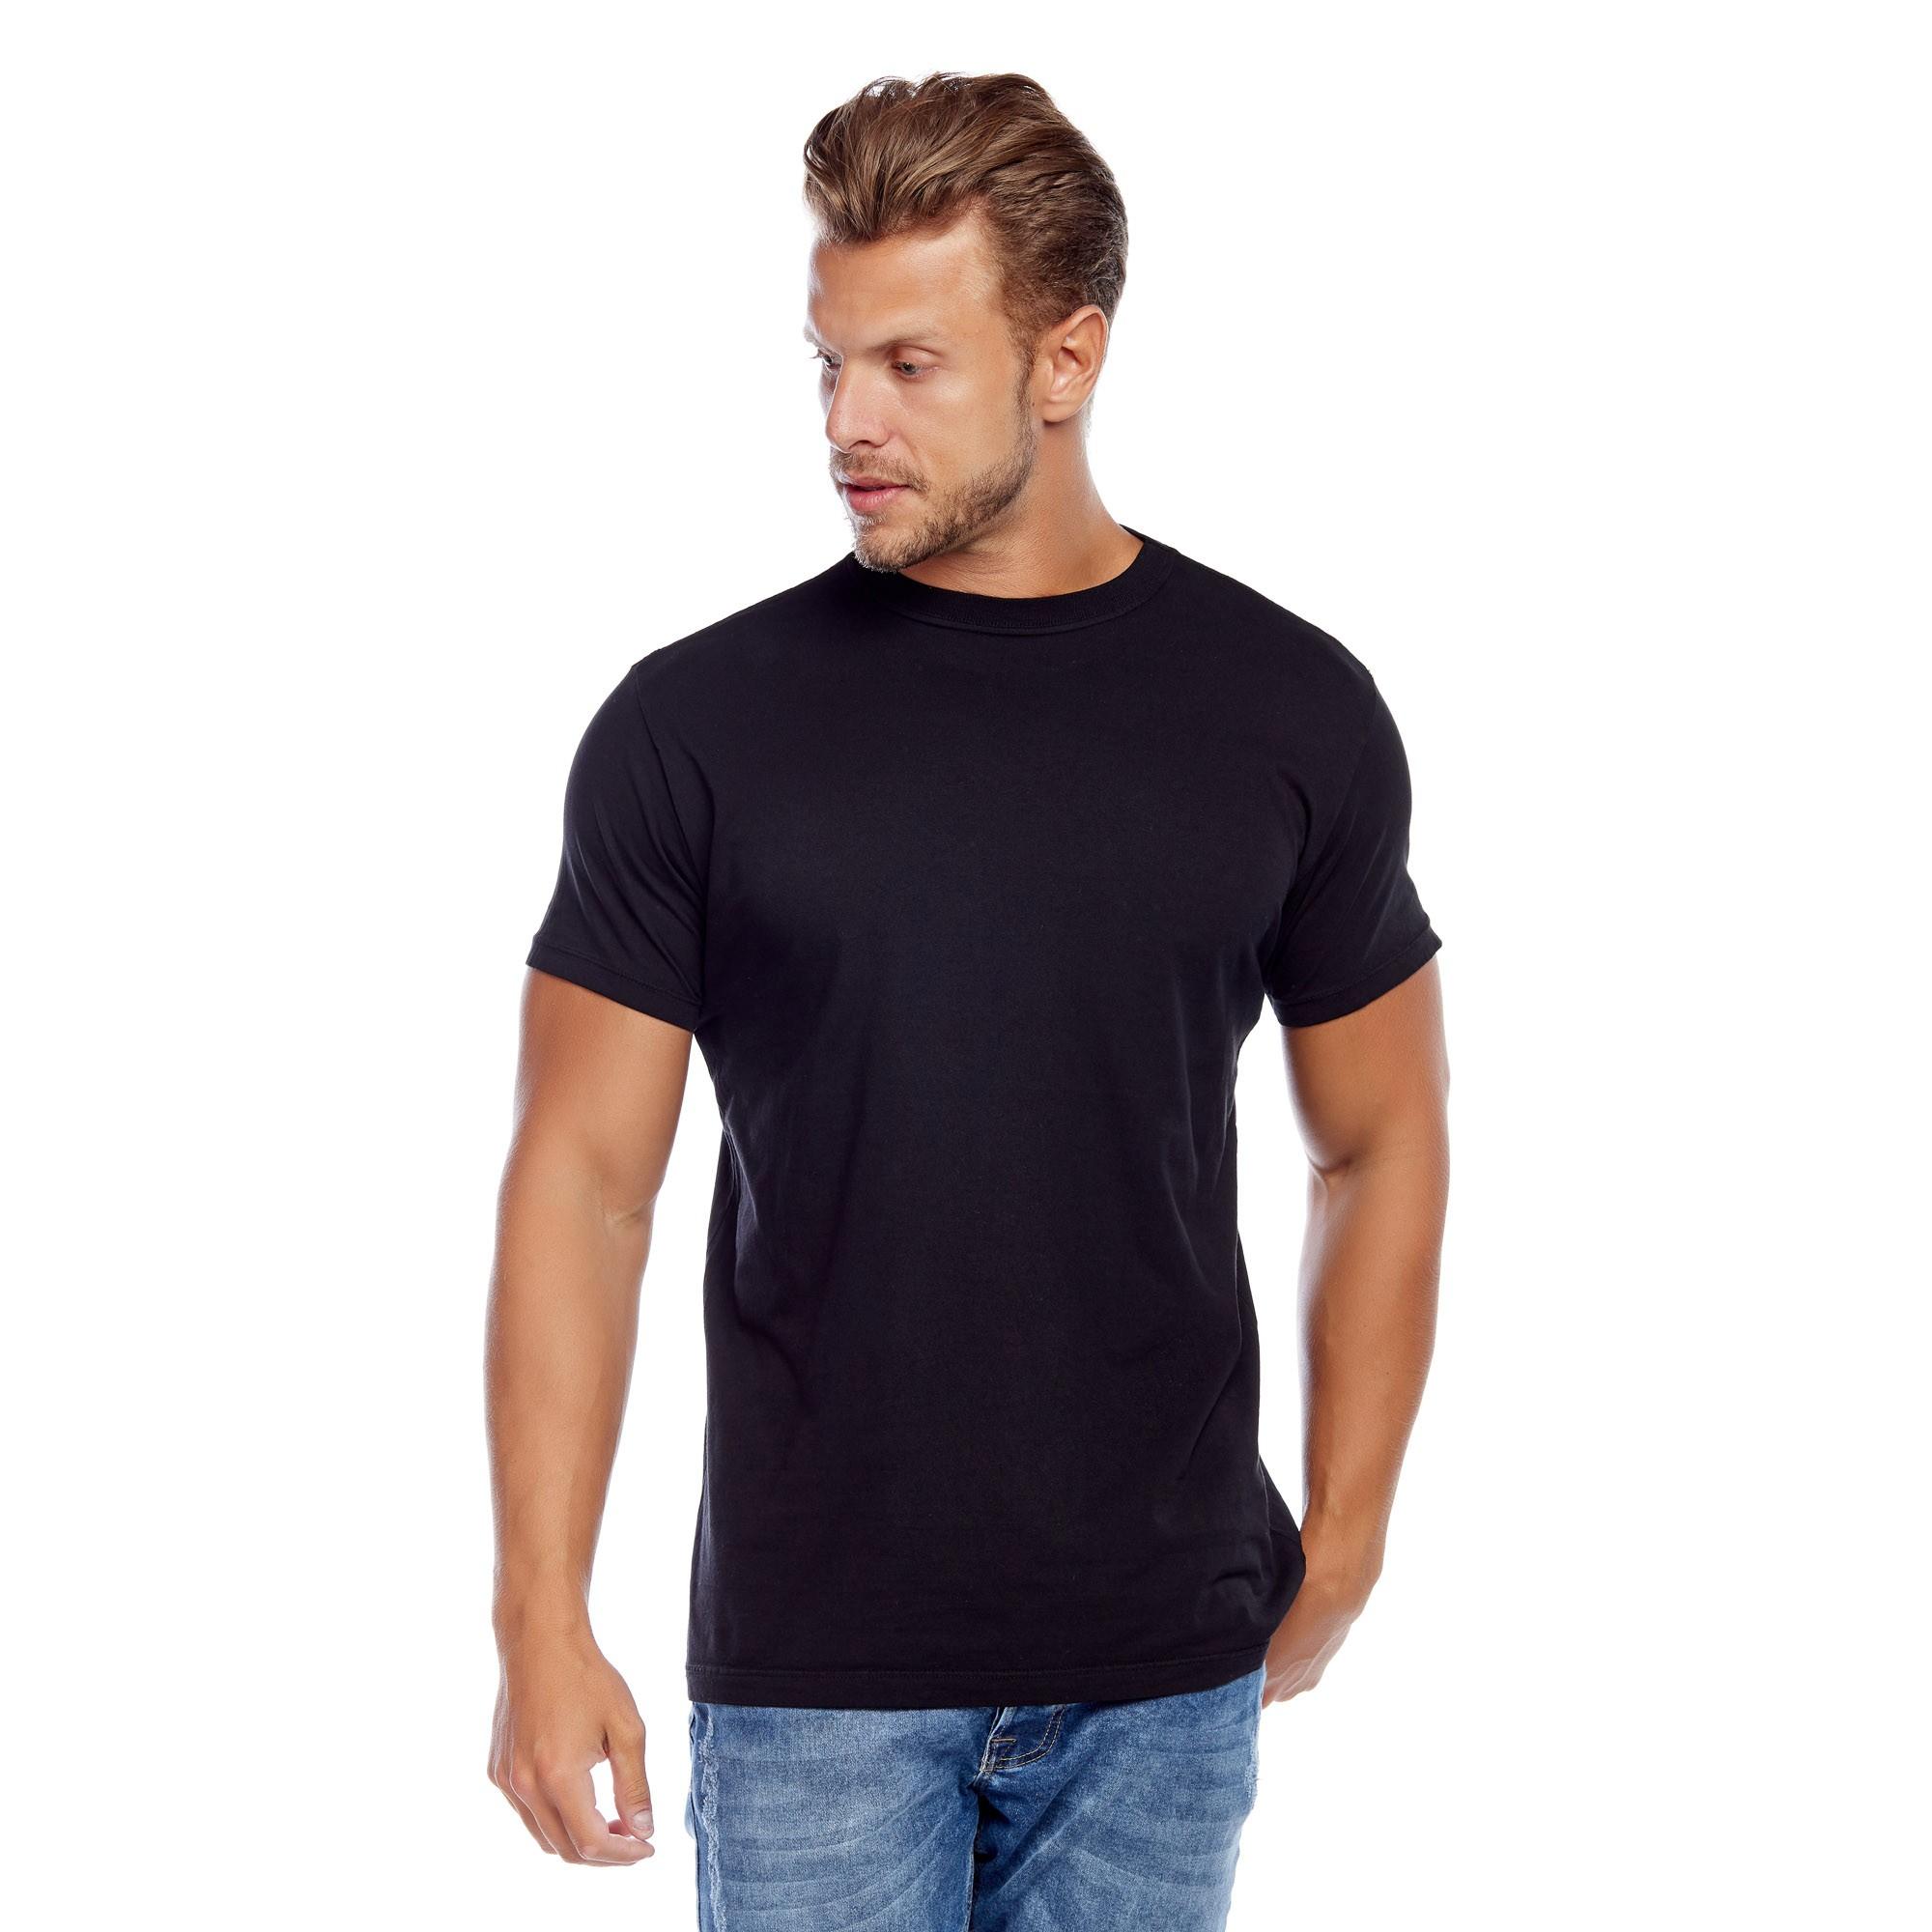 Camiseta Masculina Reativo Evolvee